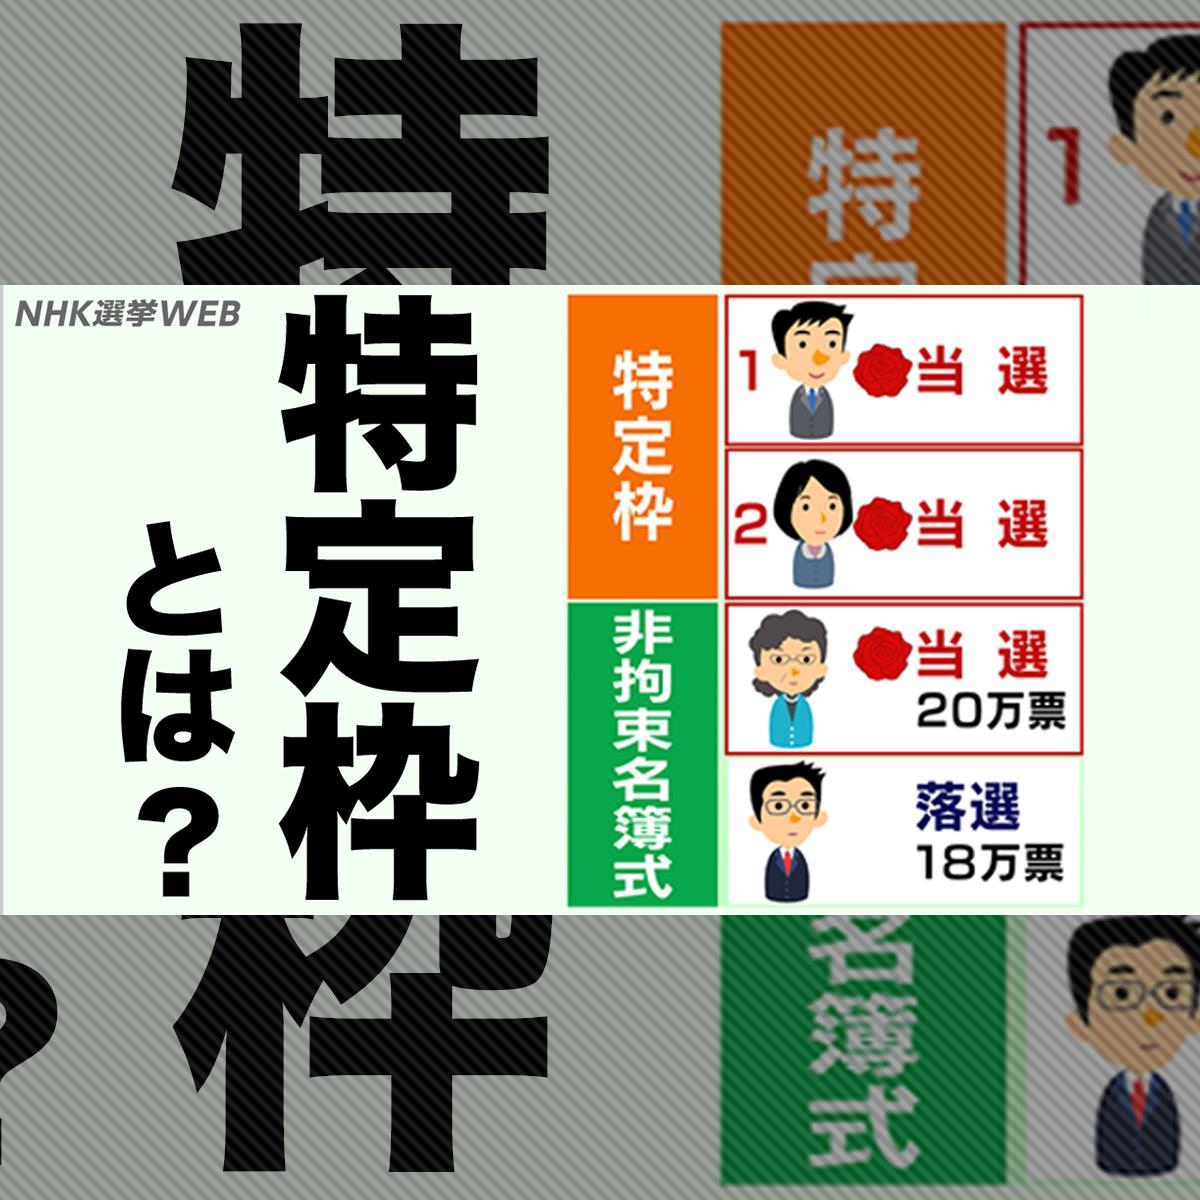 nhk 選挙 web